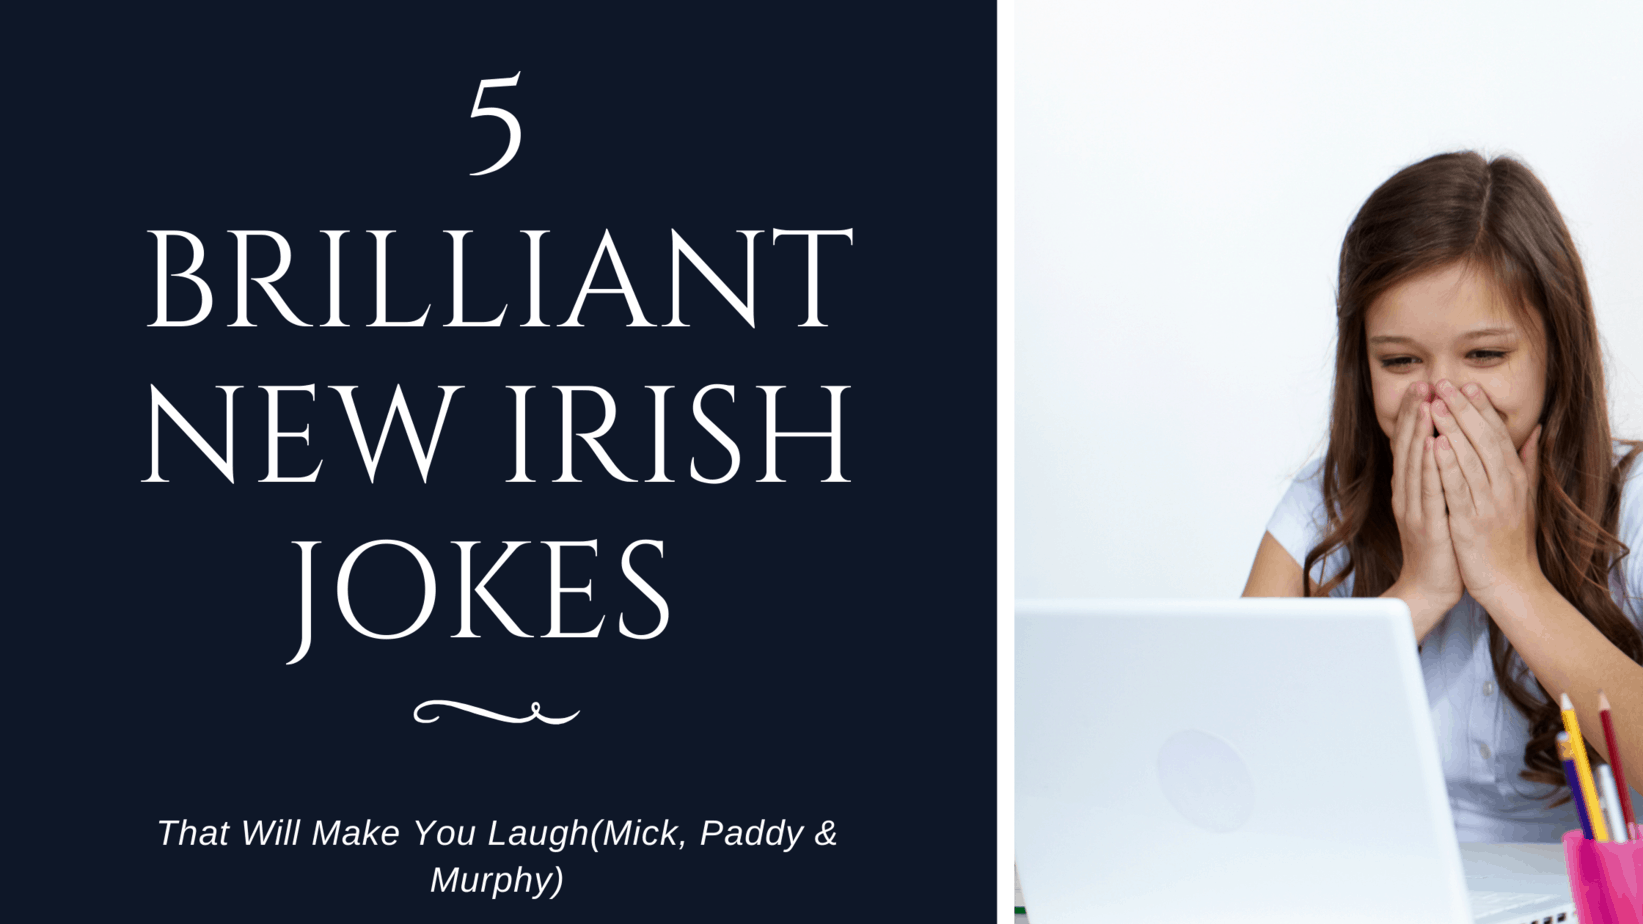 Brilliant new Irish jokes